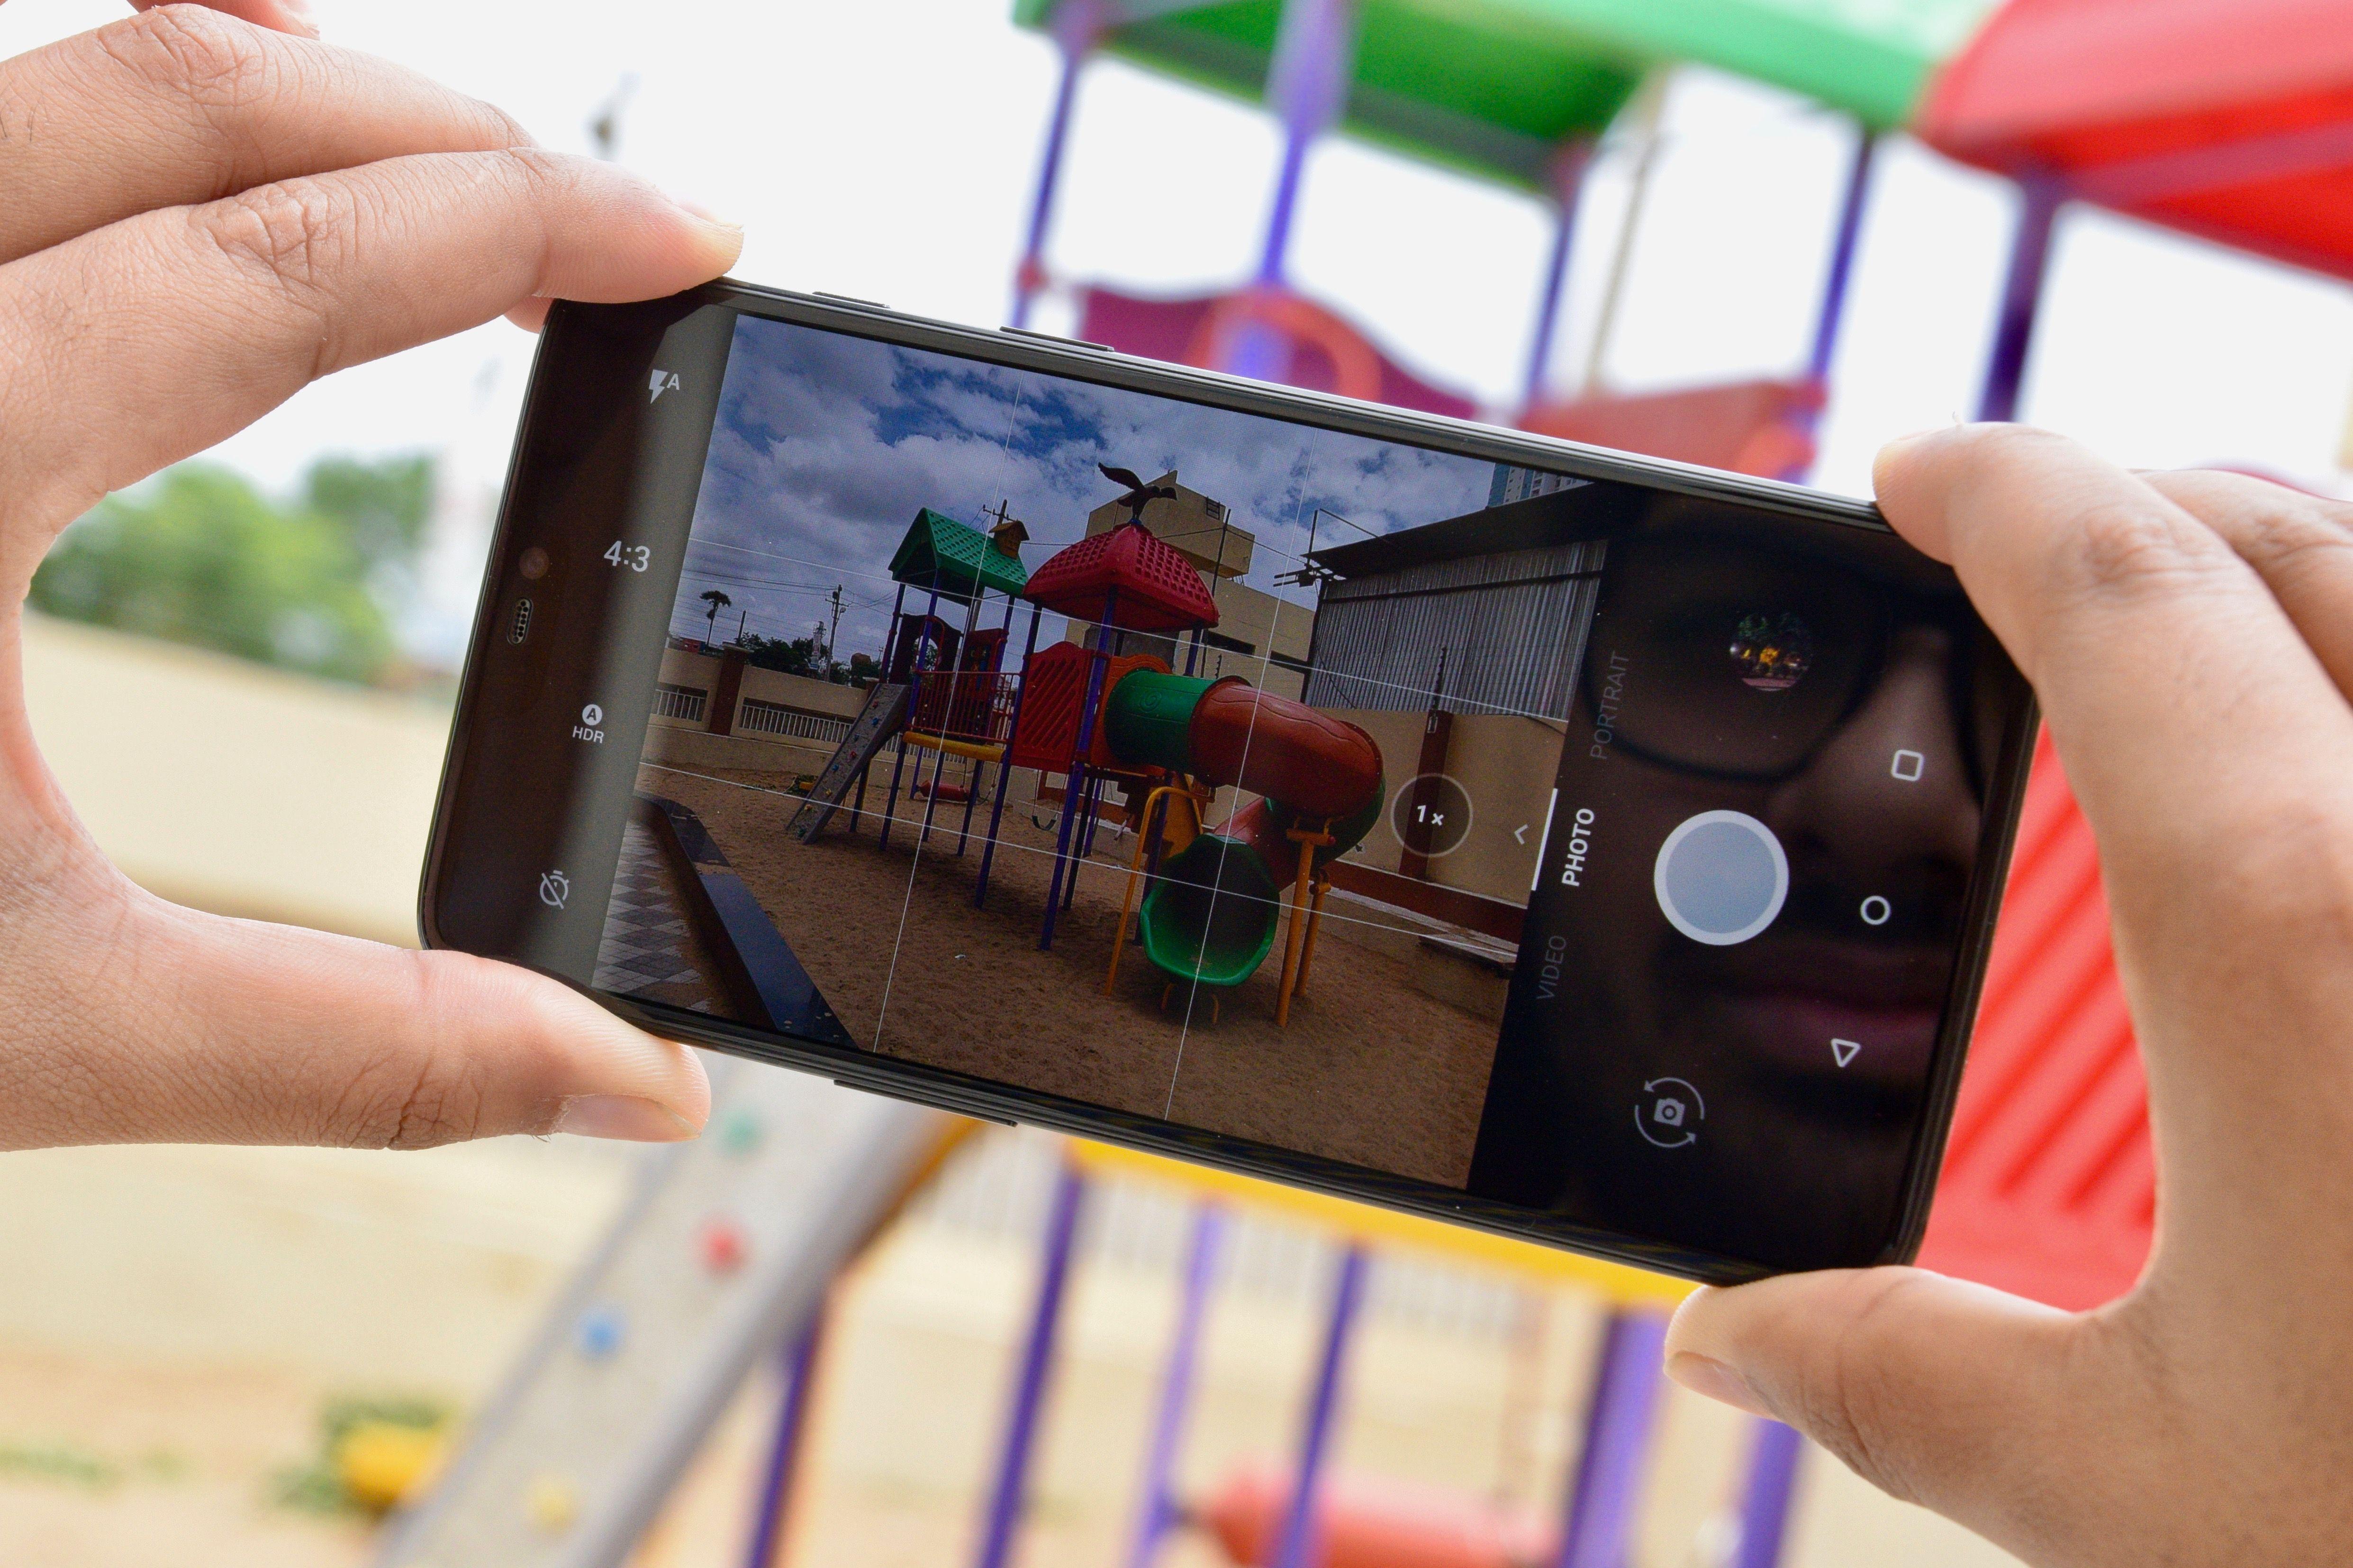 OnePlus 6 Camera App UI